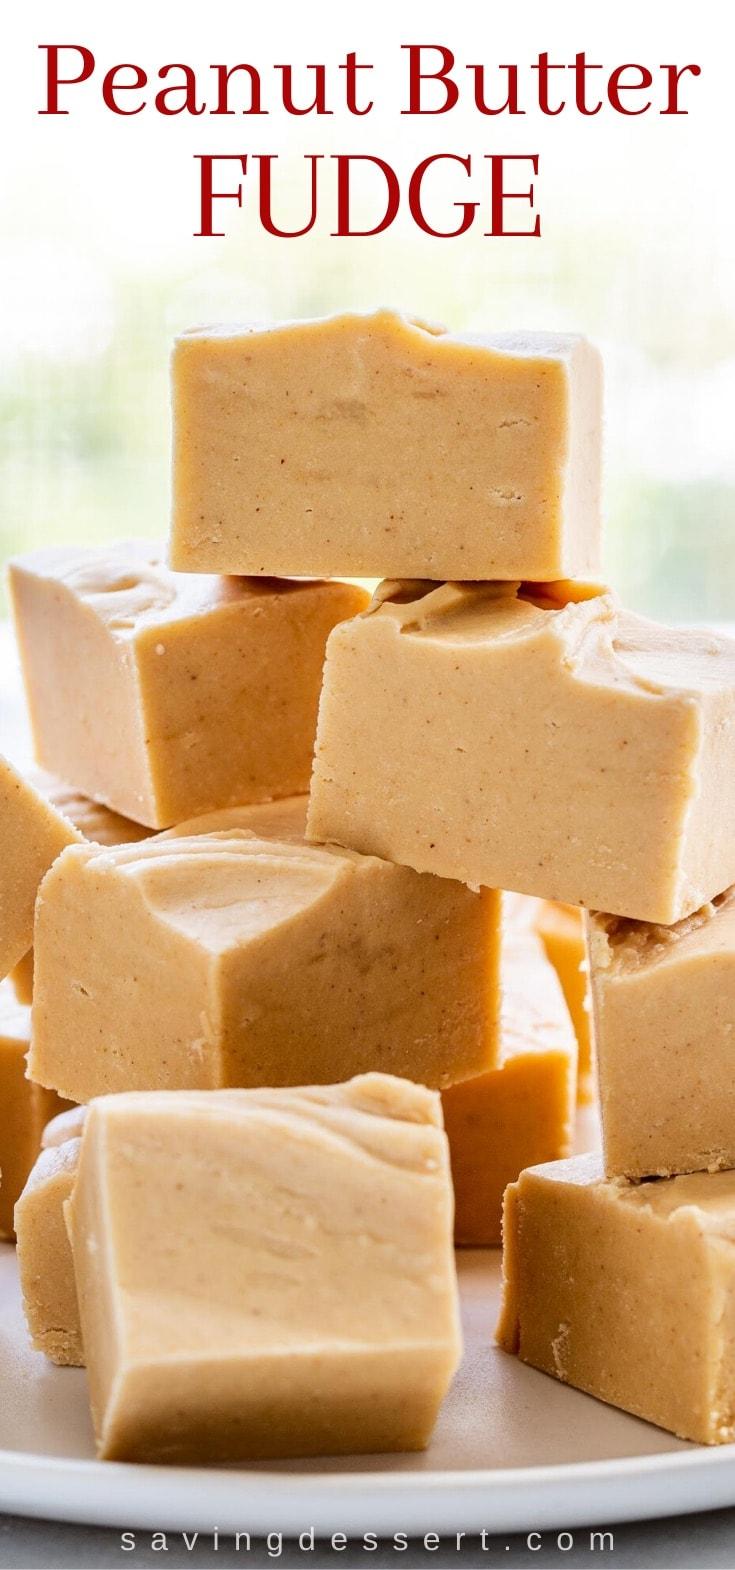 A stack of creamy peanut butter fudge